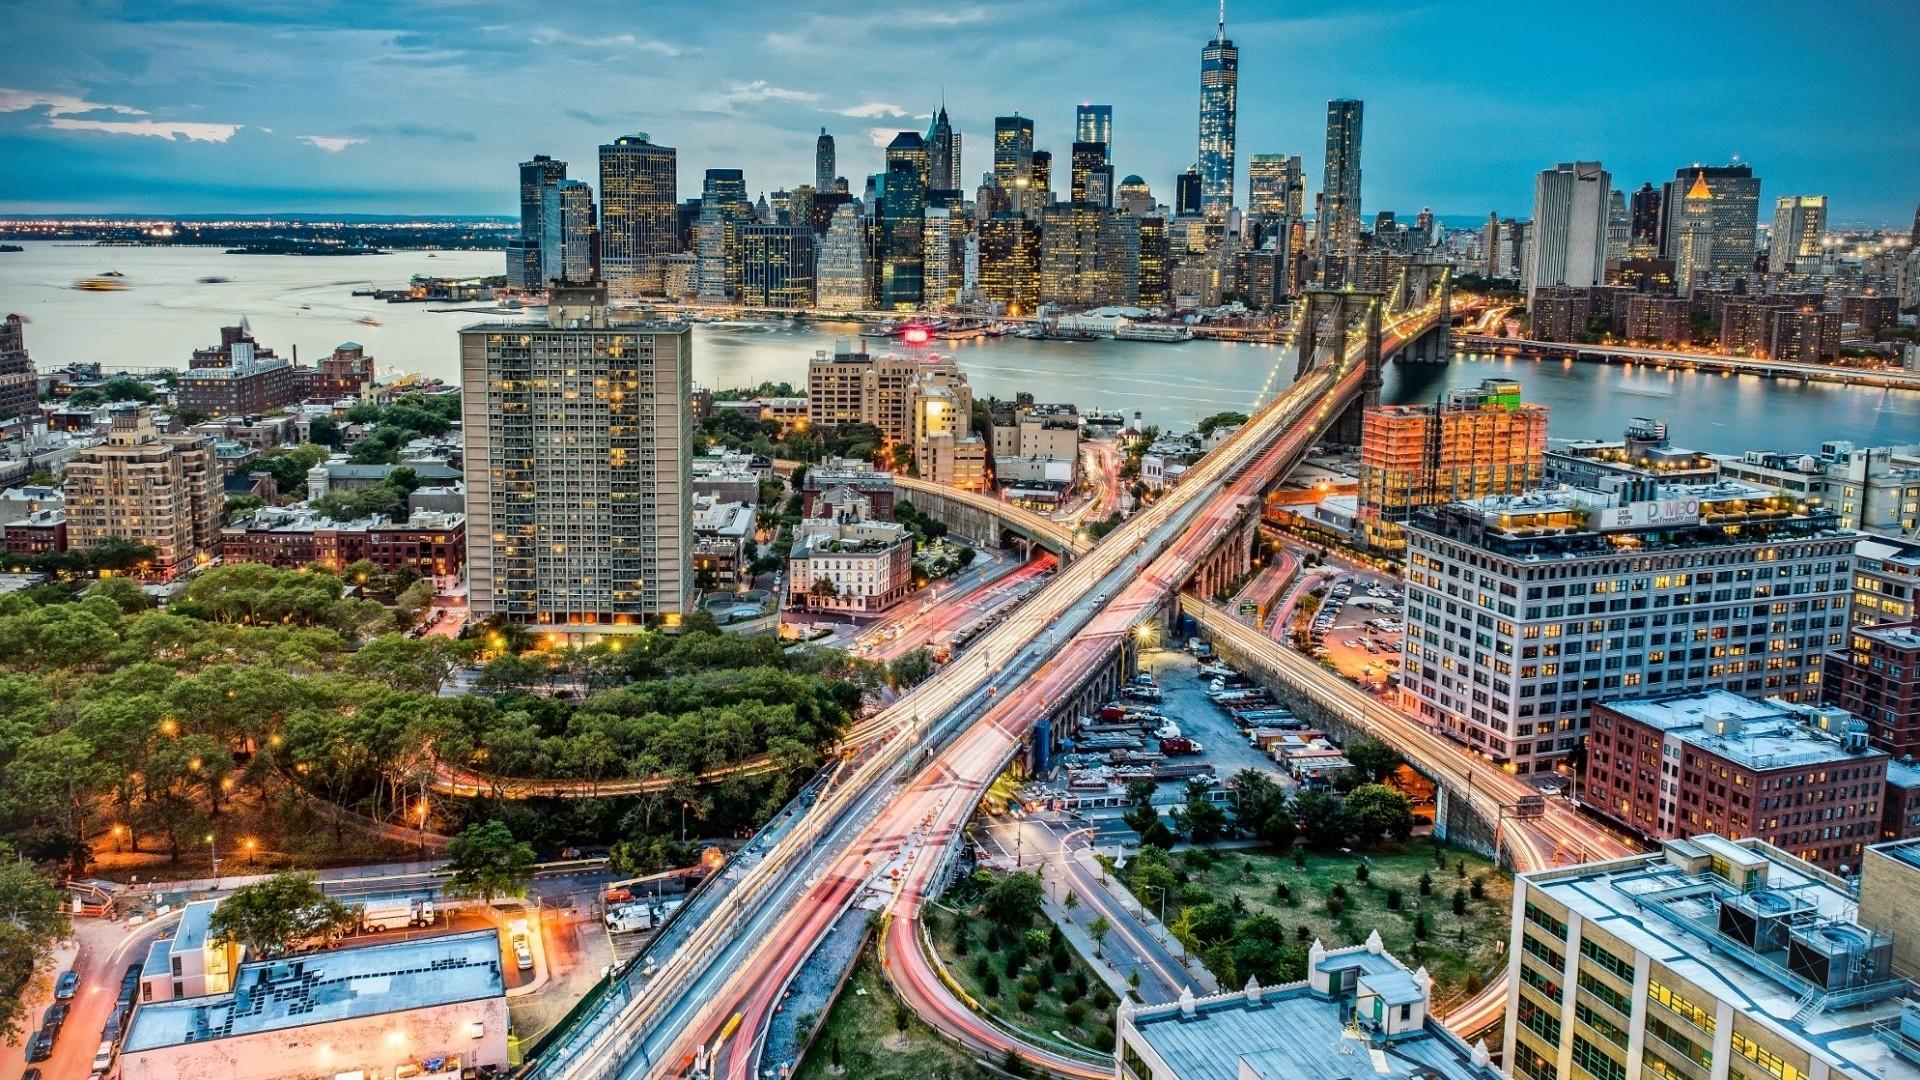 Night in manhattan new york 1920 x 1080 hdtv 1080p wallpaper - Wallpaper 1080p new york ...